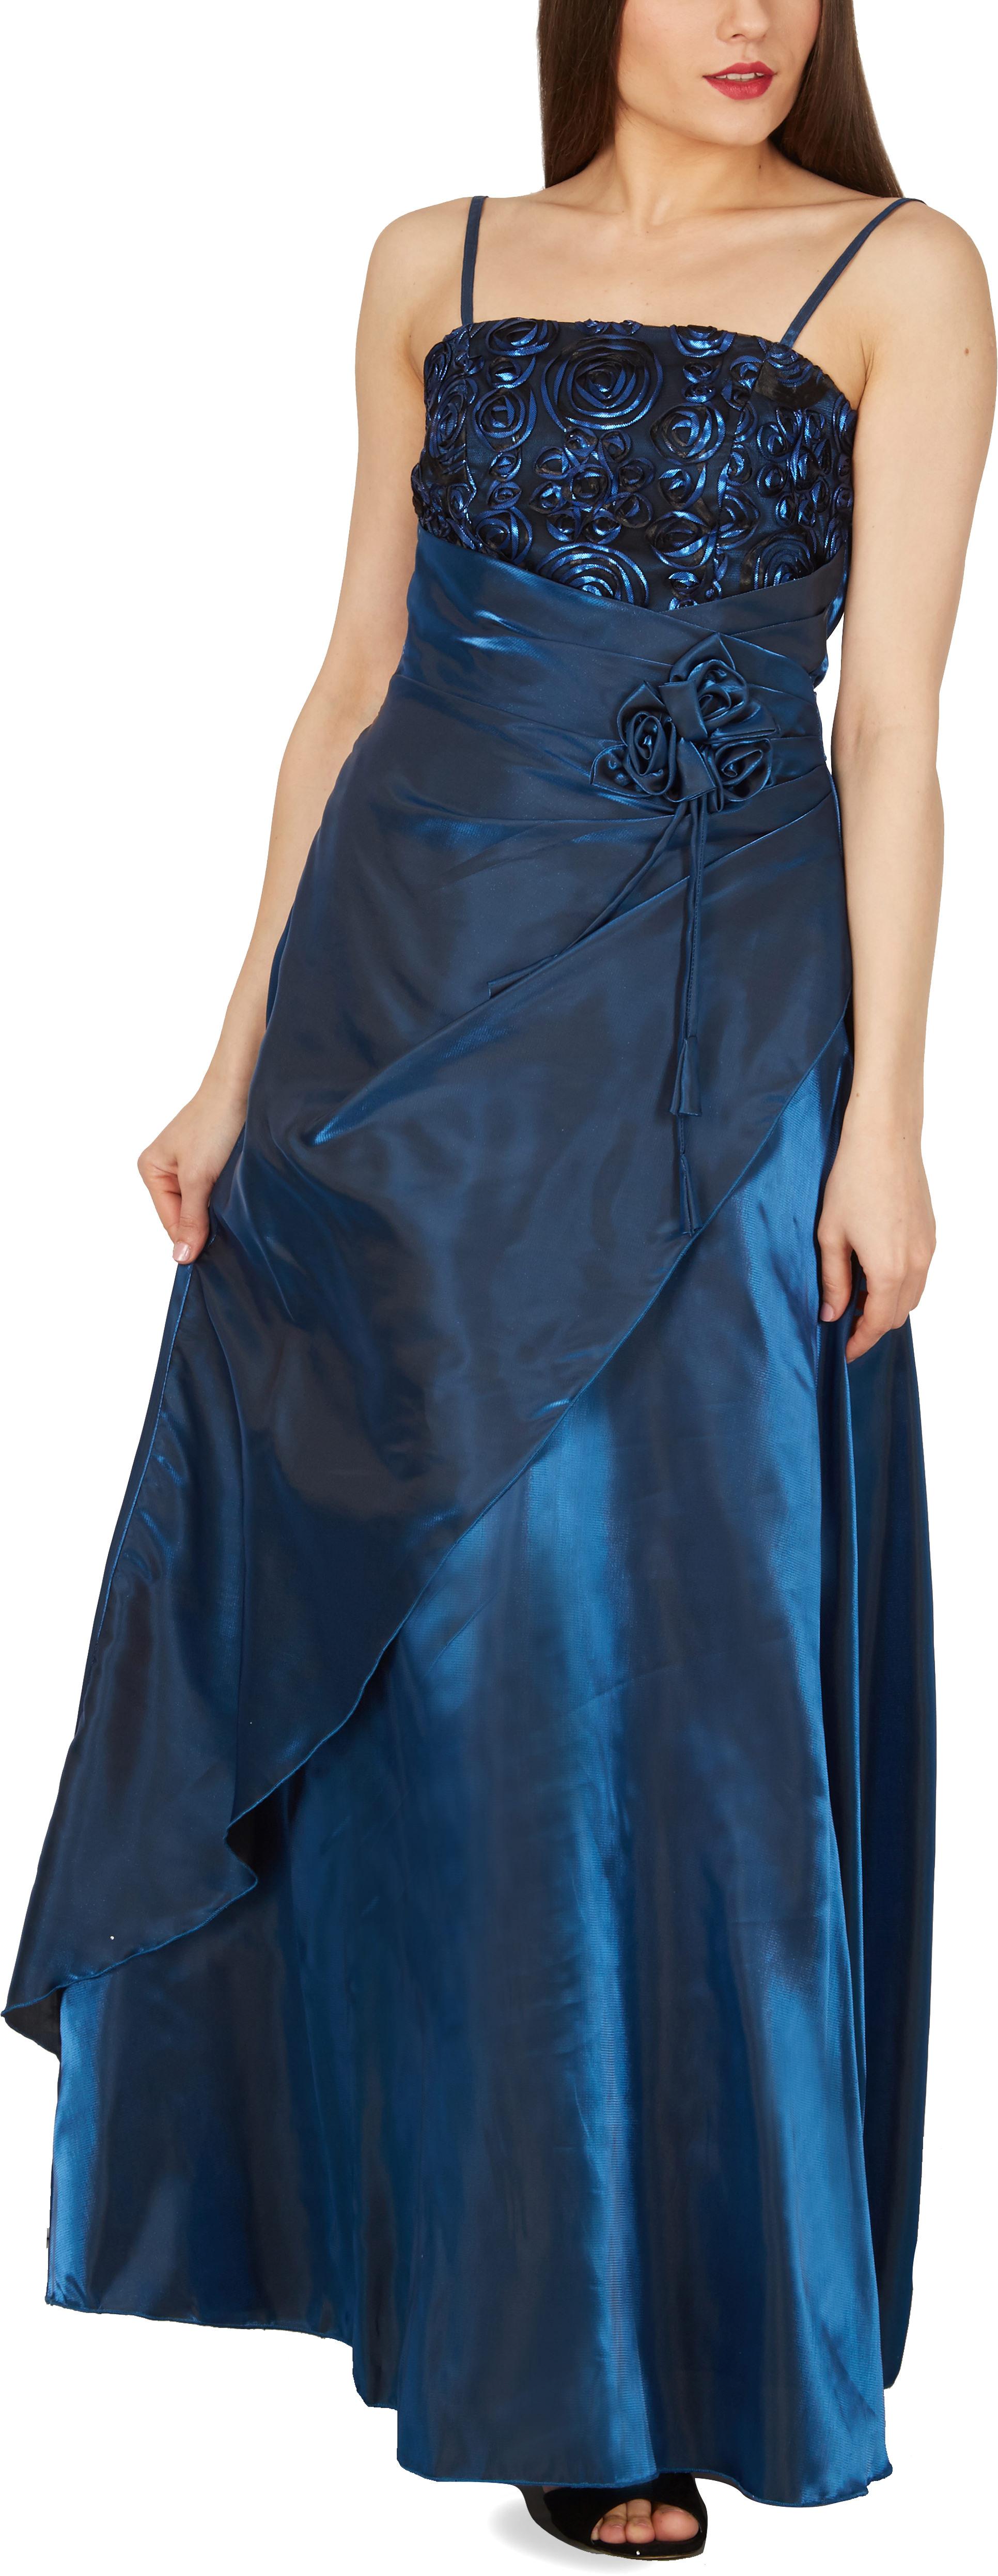 long satin evening wedding bridesmaid ball gown